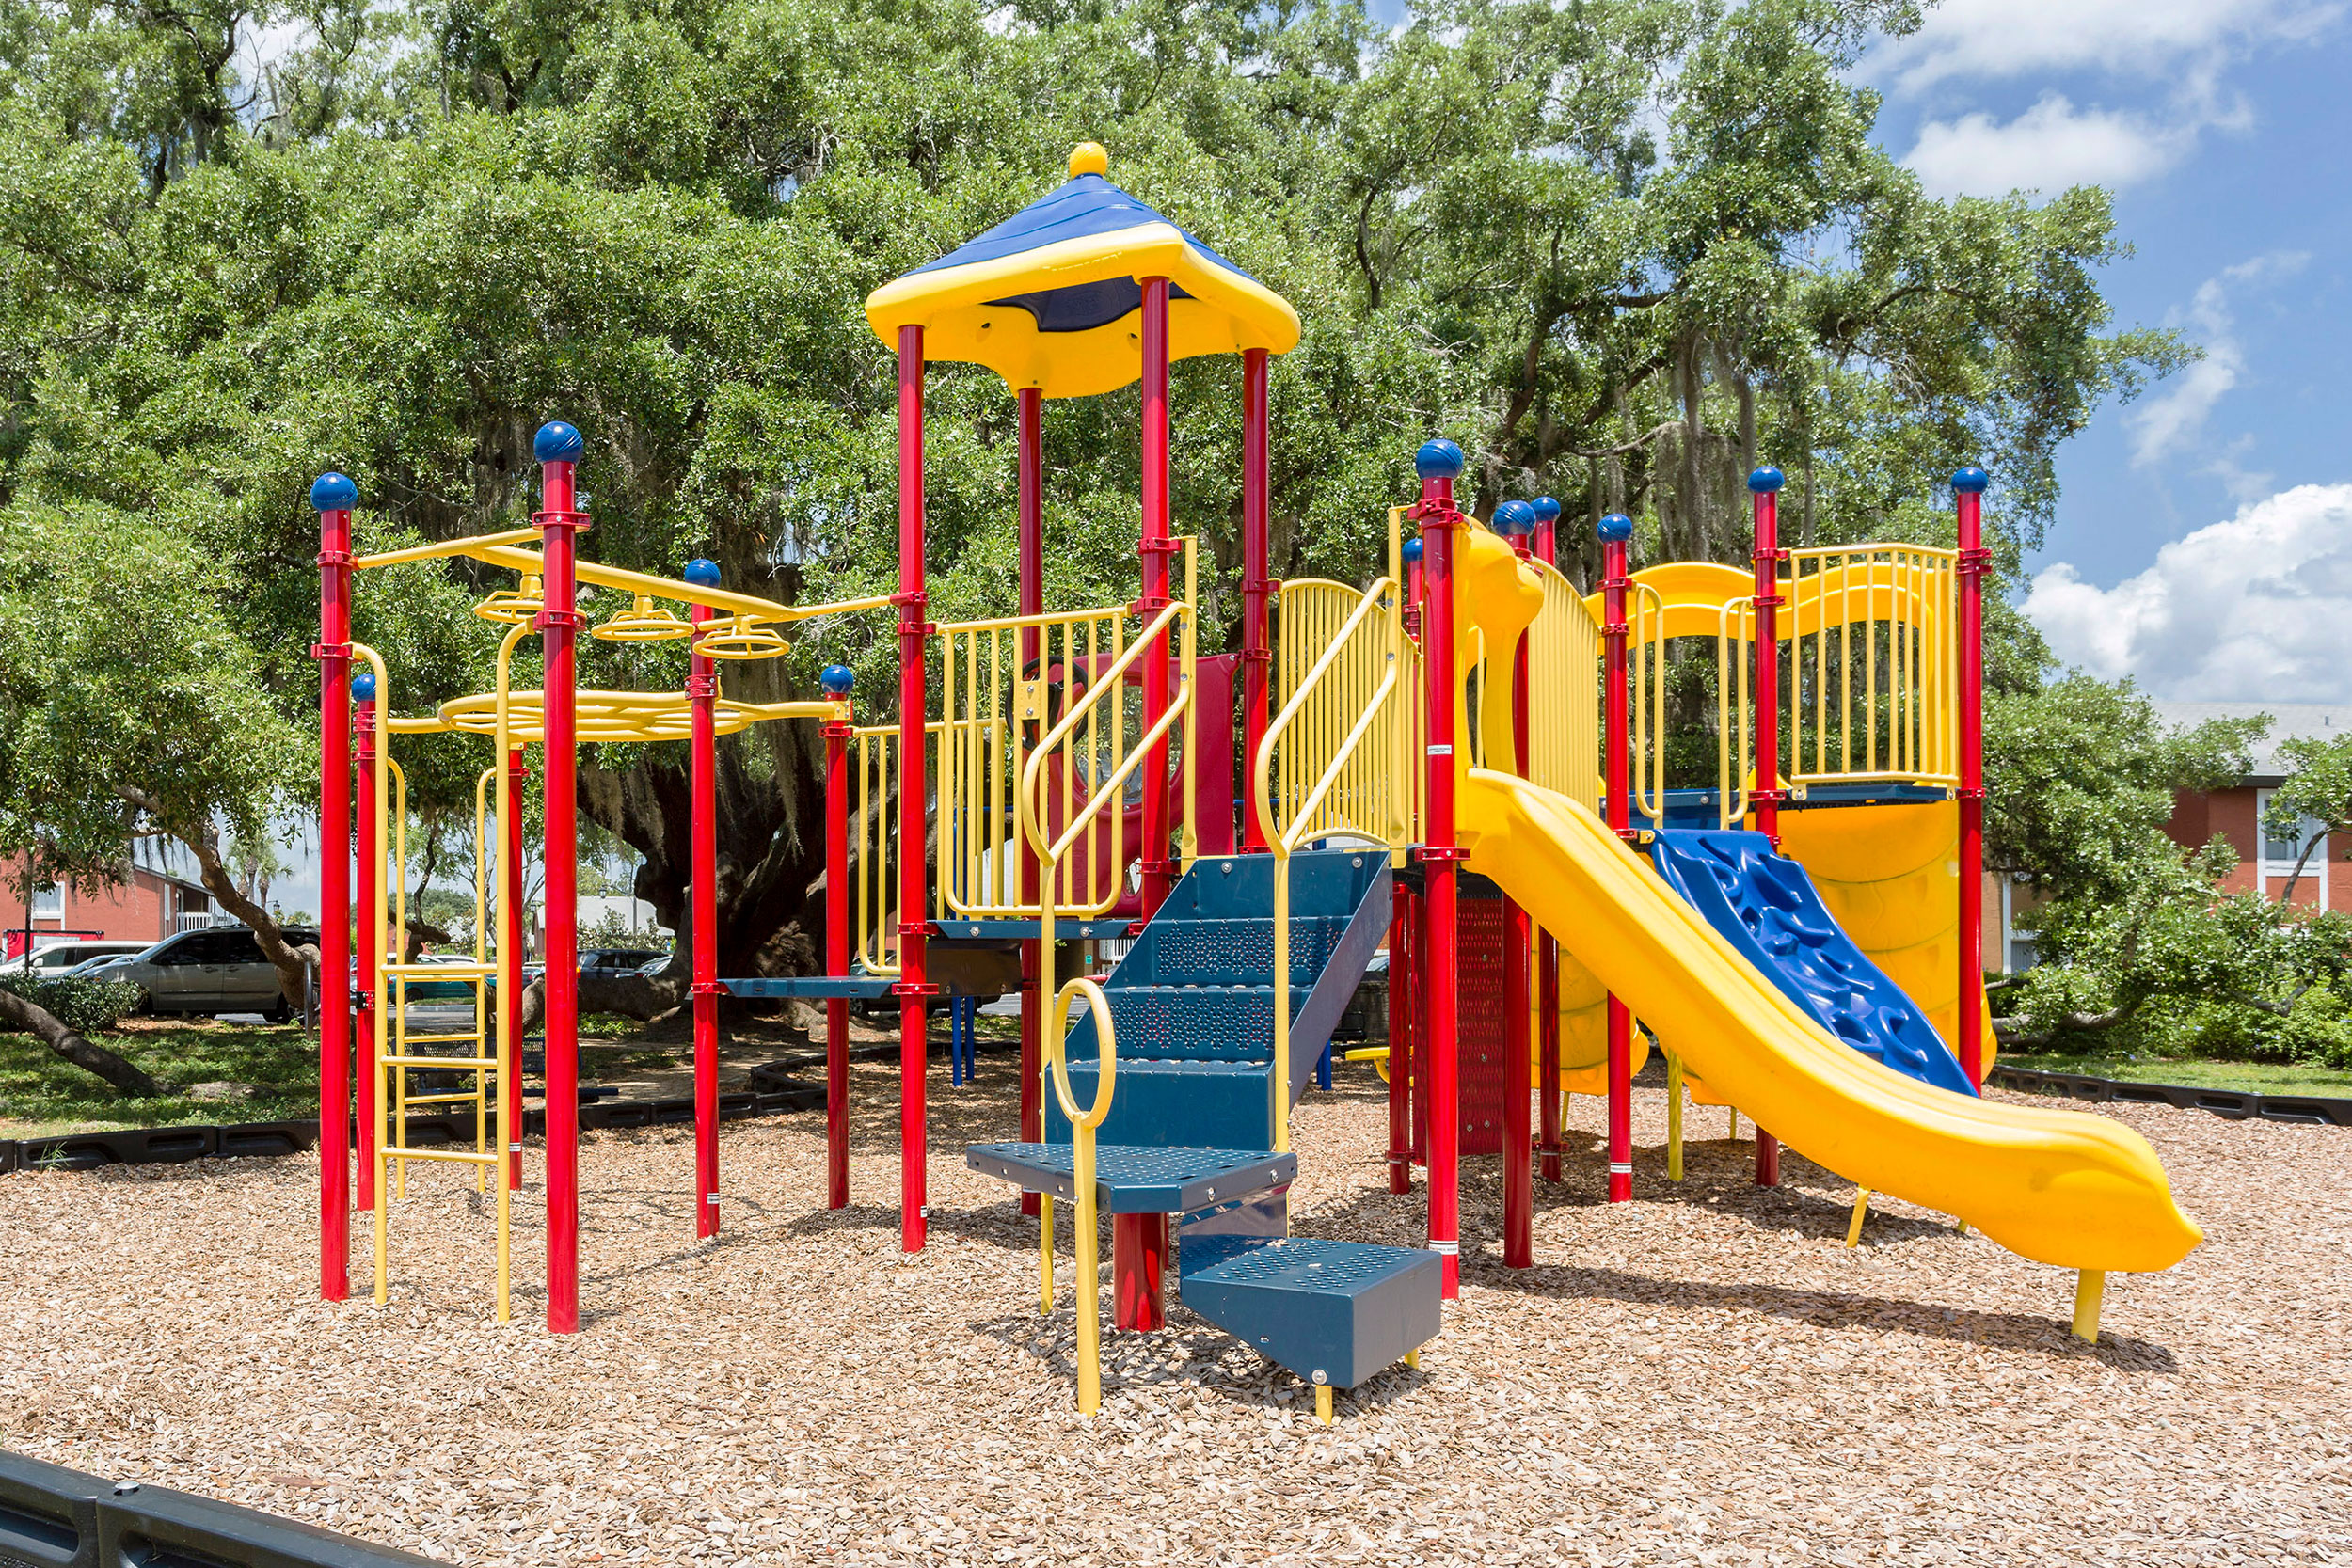 Hb-amen-playground